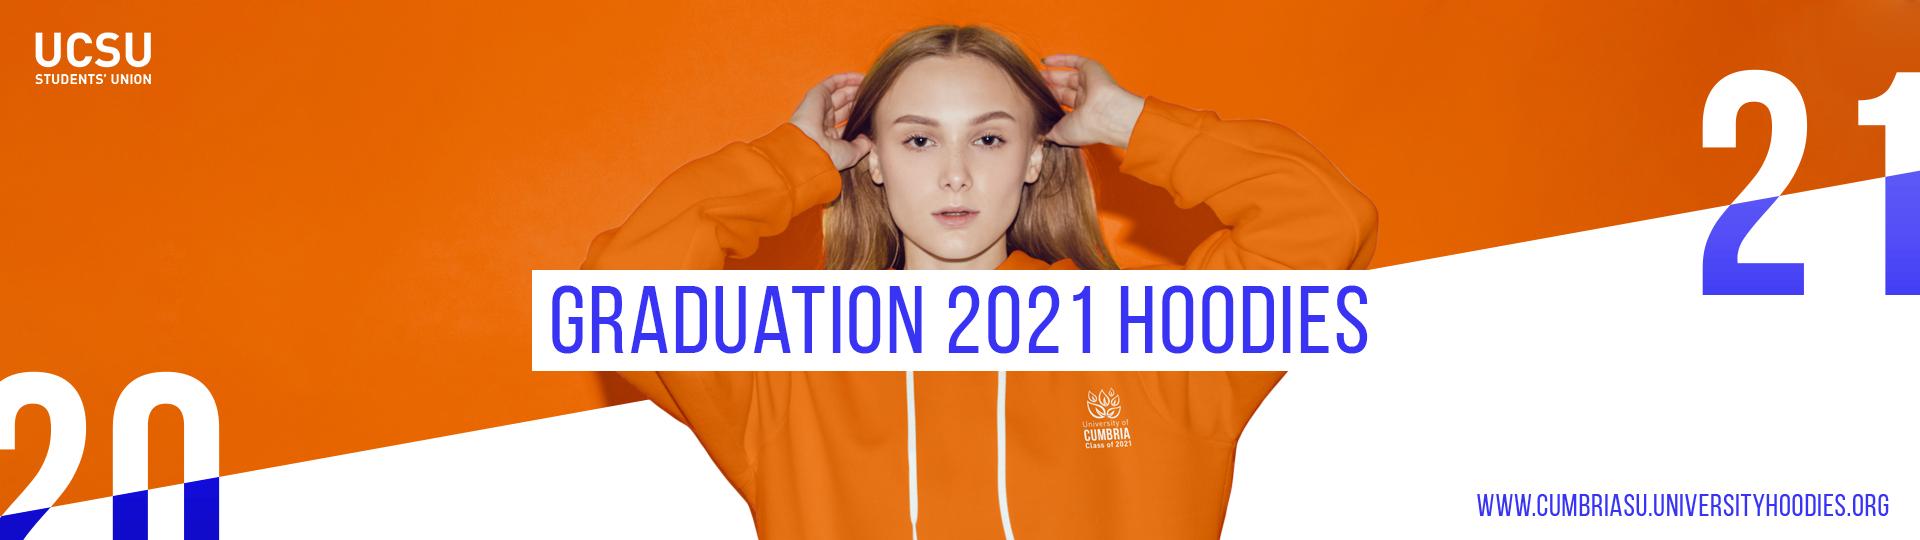 Grad 2021 web banner